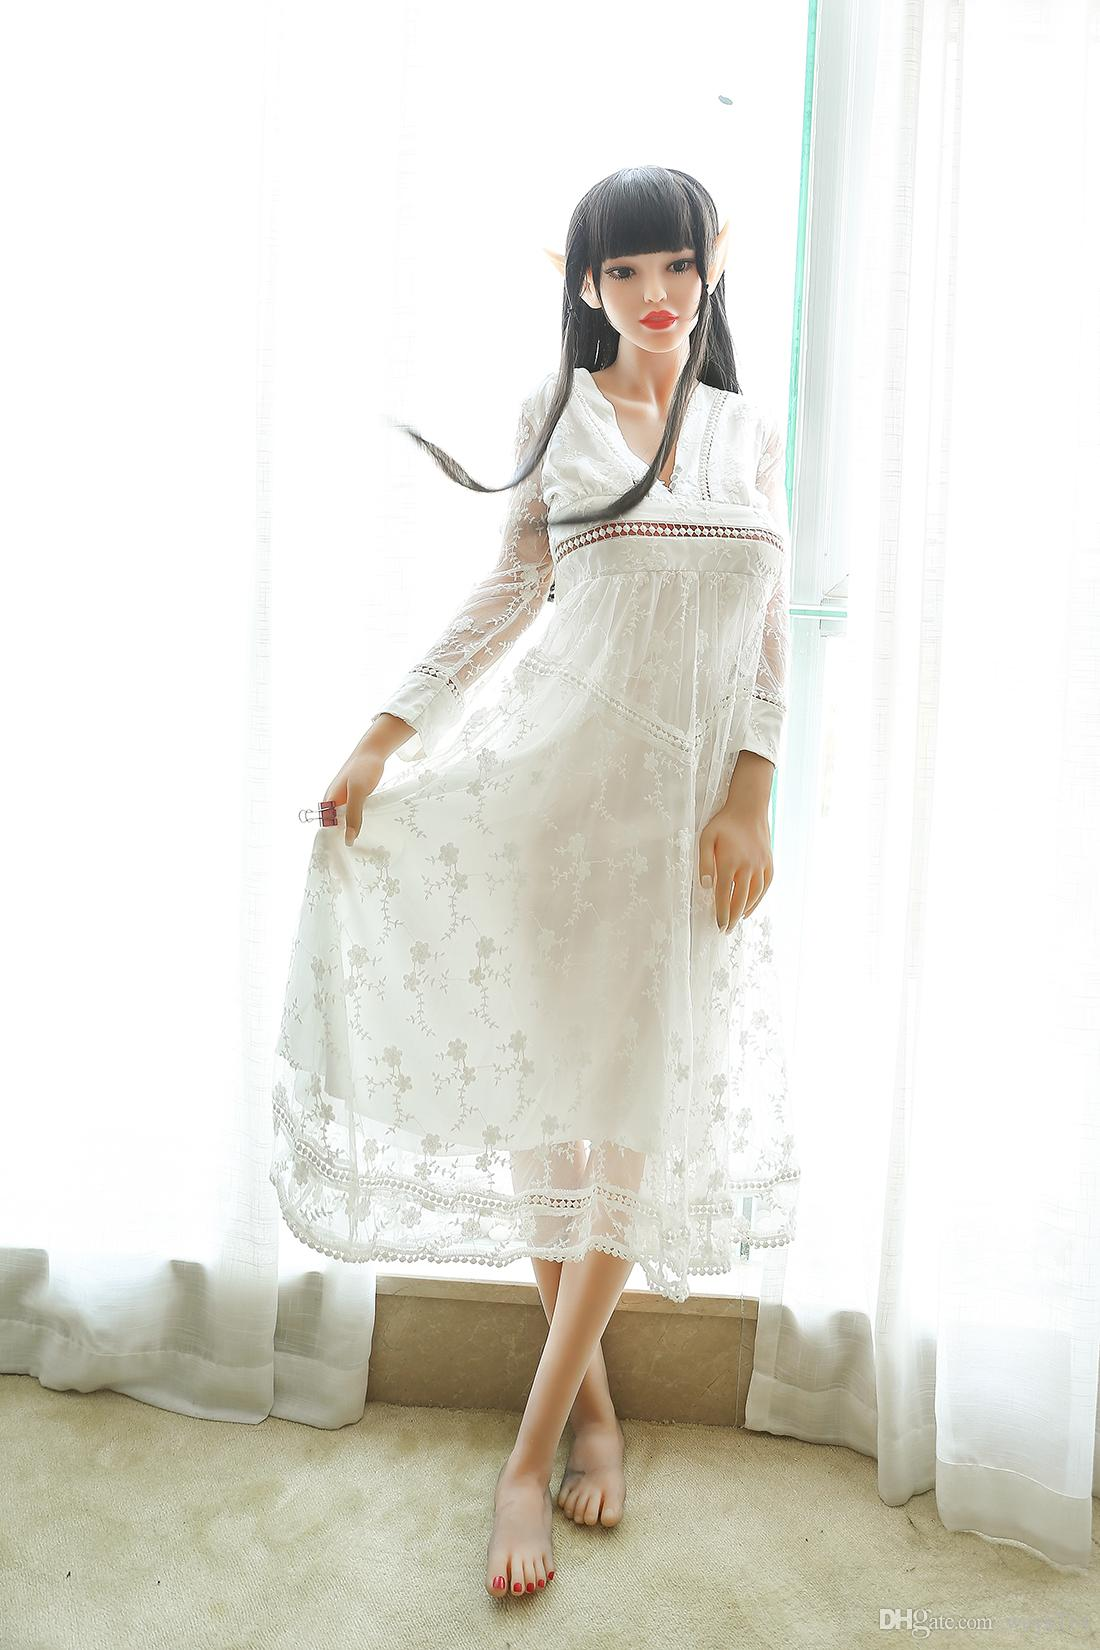 165cm Spirit Flesh Silicone Lifelike Big Boobs Love Dolls Realistic Sex Doll Sex Toys For Man Masturbation With Large Breast